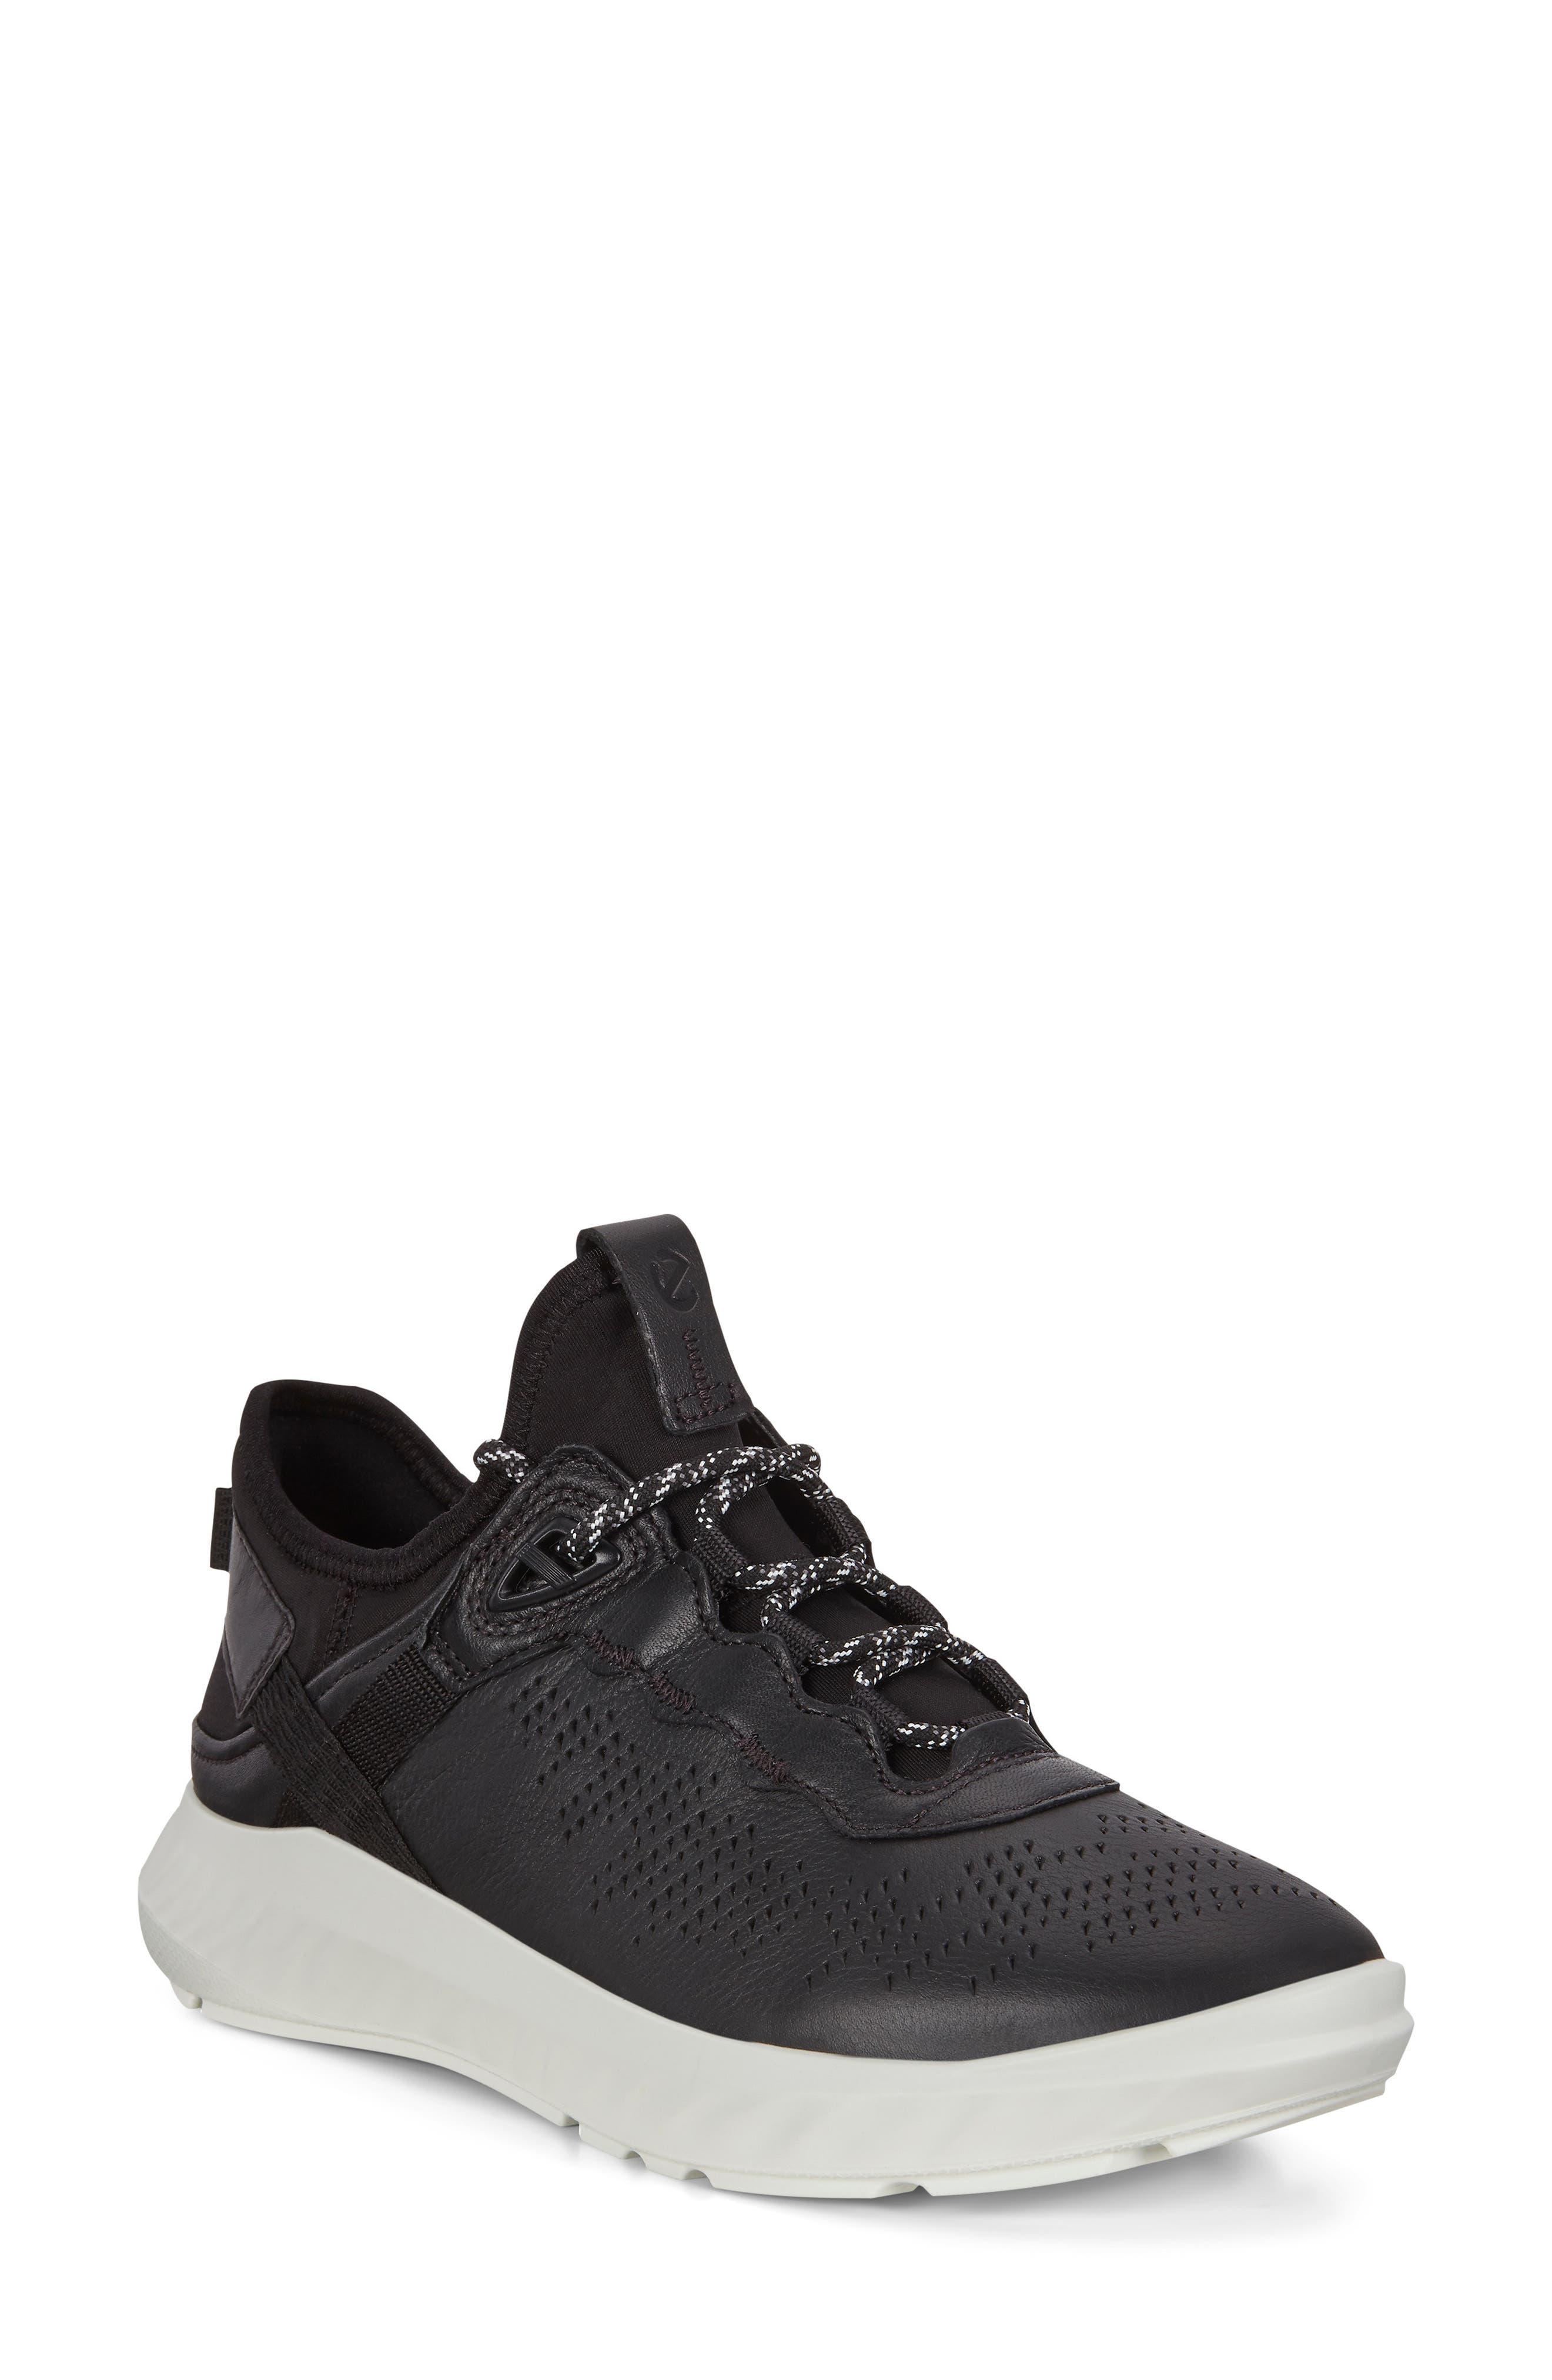 ECCO Women's Ecco St.1 Lite Sneaker, Size 9-9.5US - Black